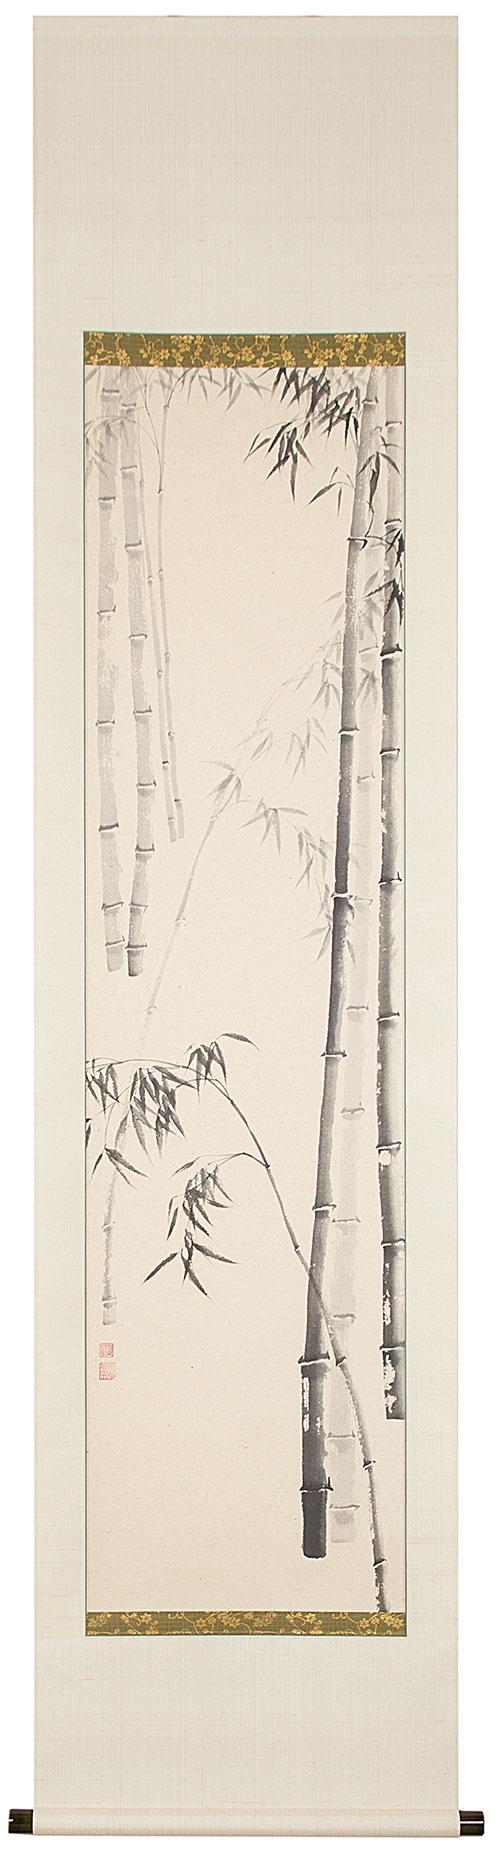 192-Bambus-IMG_8203-Kopie.jpg